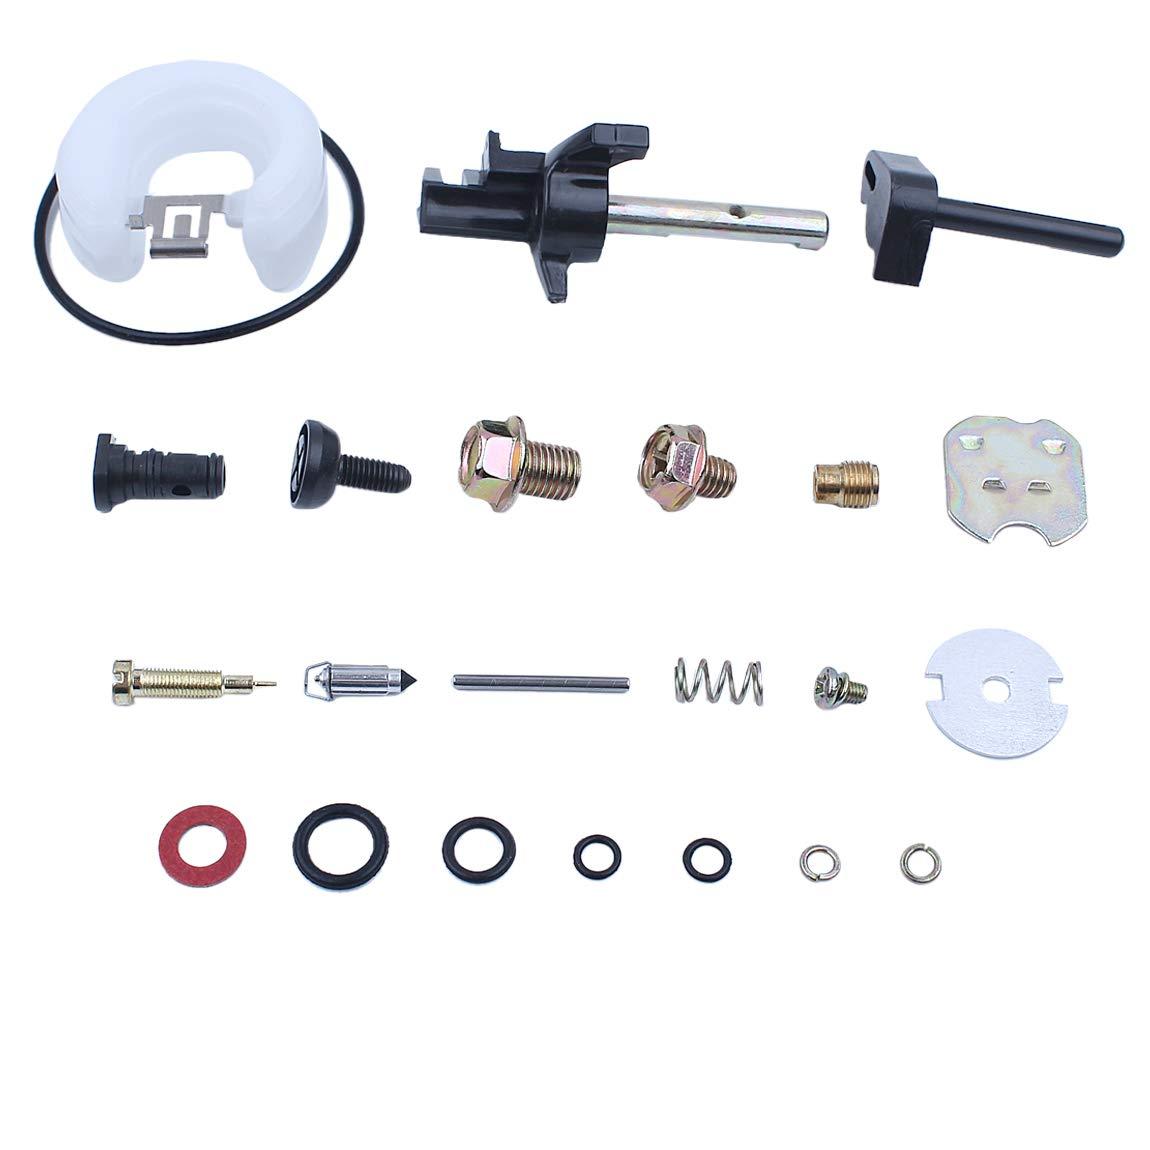 Haishine Carburatore Carb Repair Kit di ricostruzione Fit Honda GX200 GX160 GX120 5.5HP 6.5HP 168F 170F Motore Generatore del Motore Trimmer